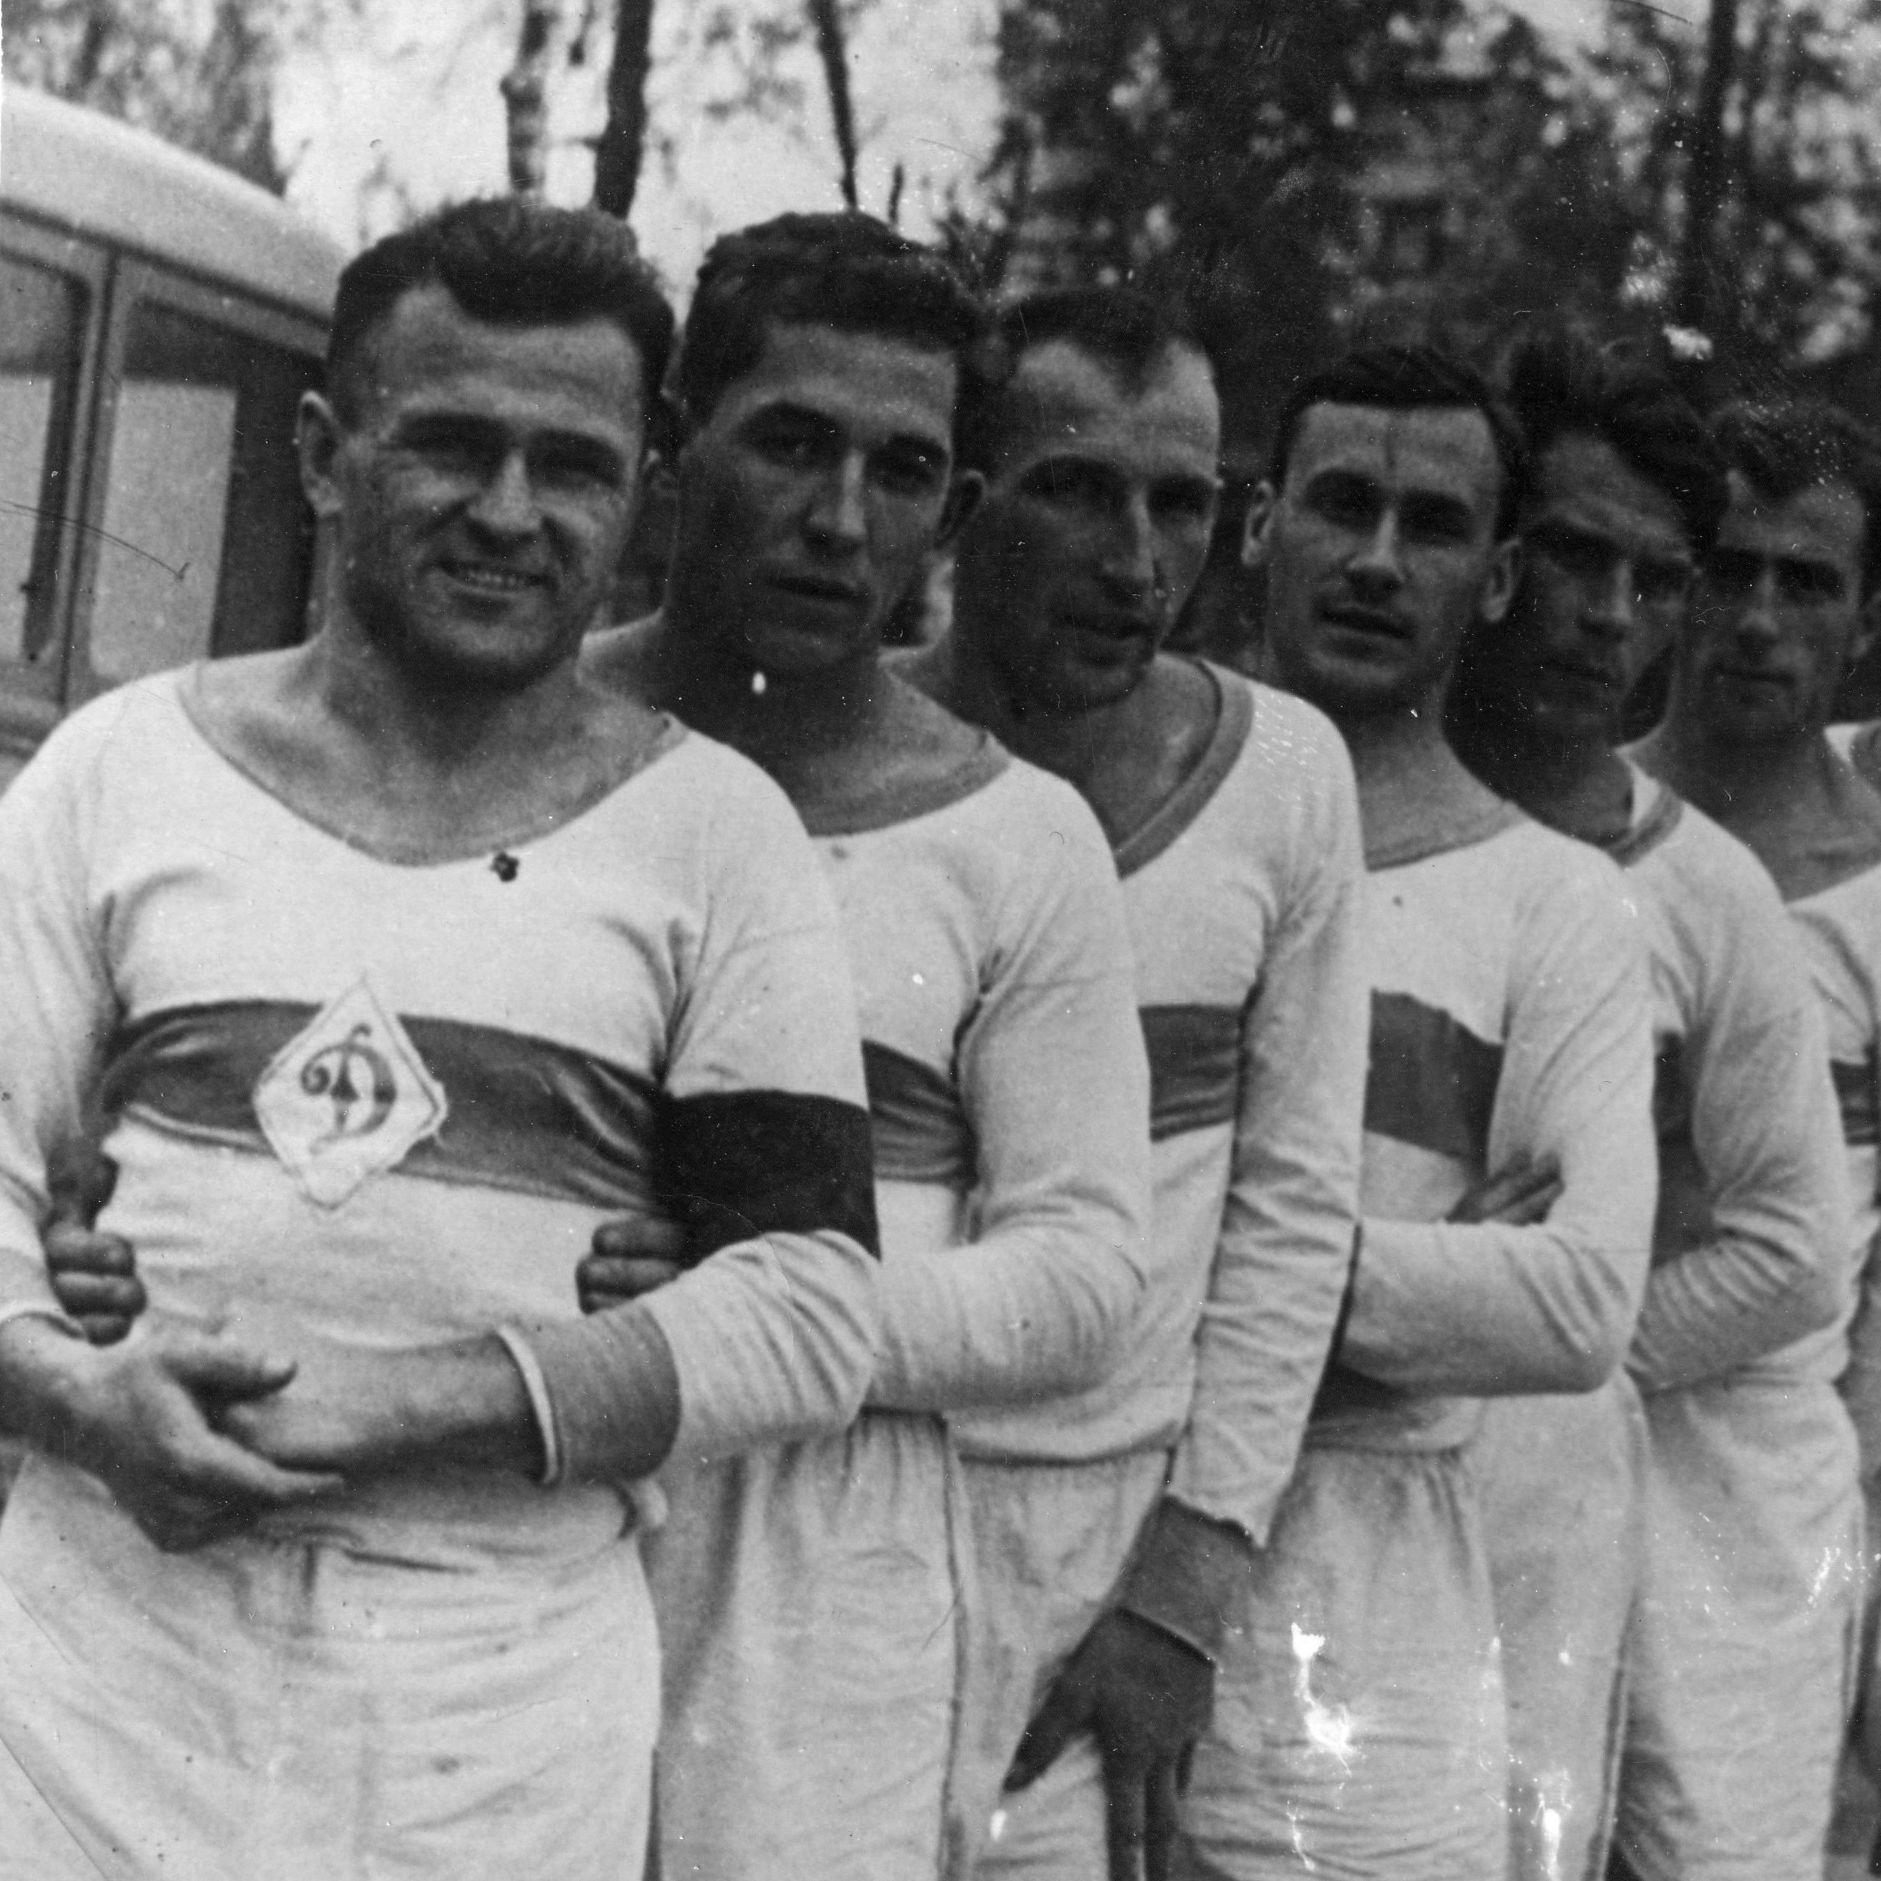 USSR silver medalist